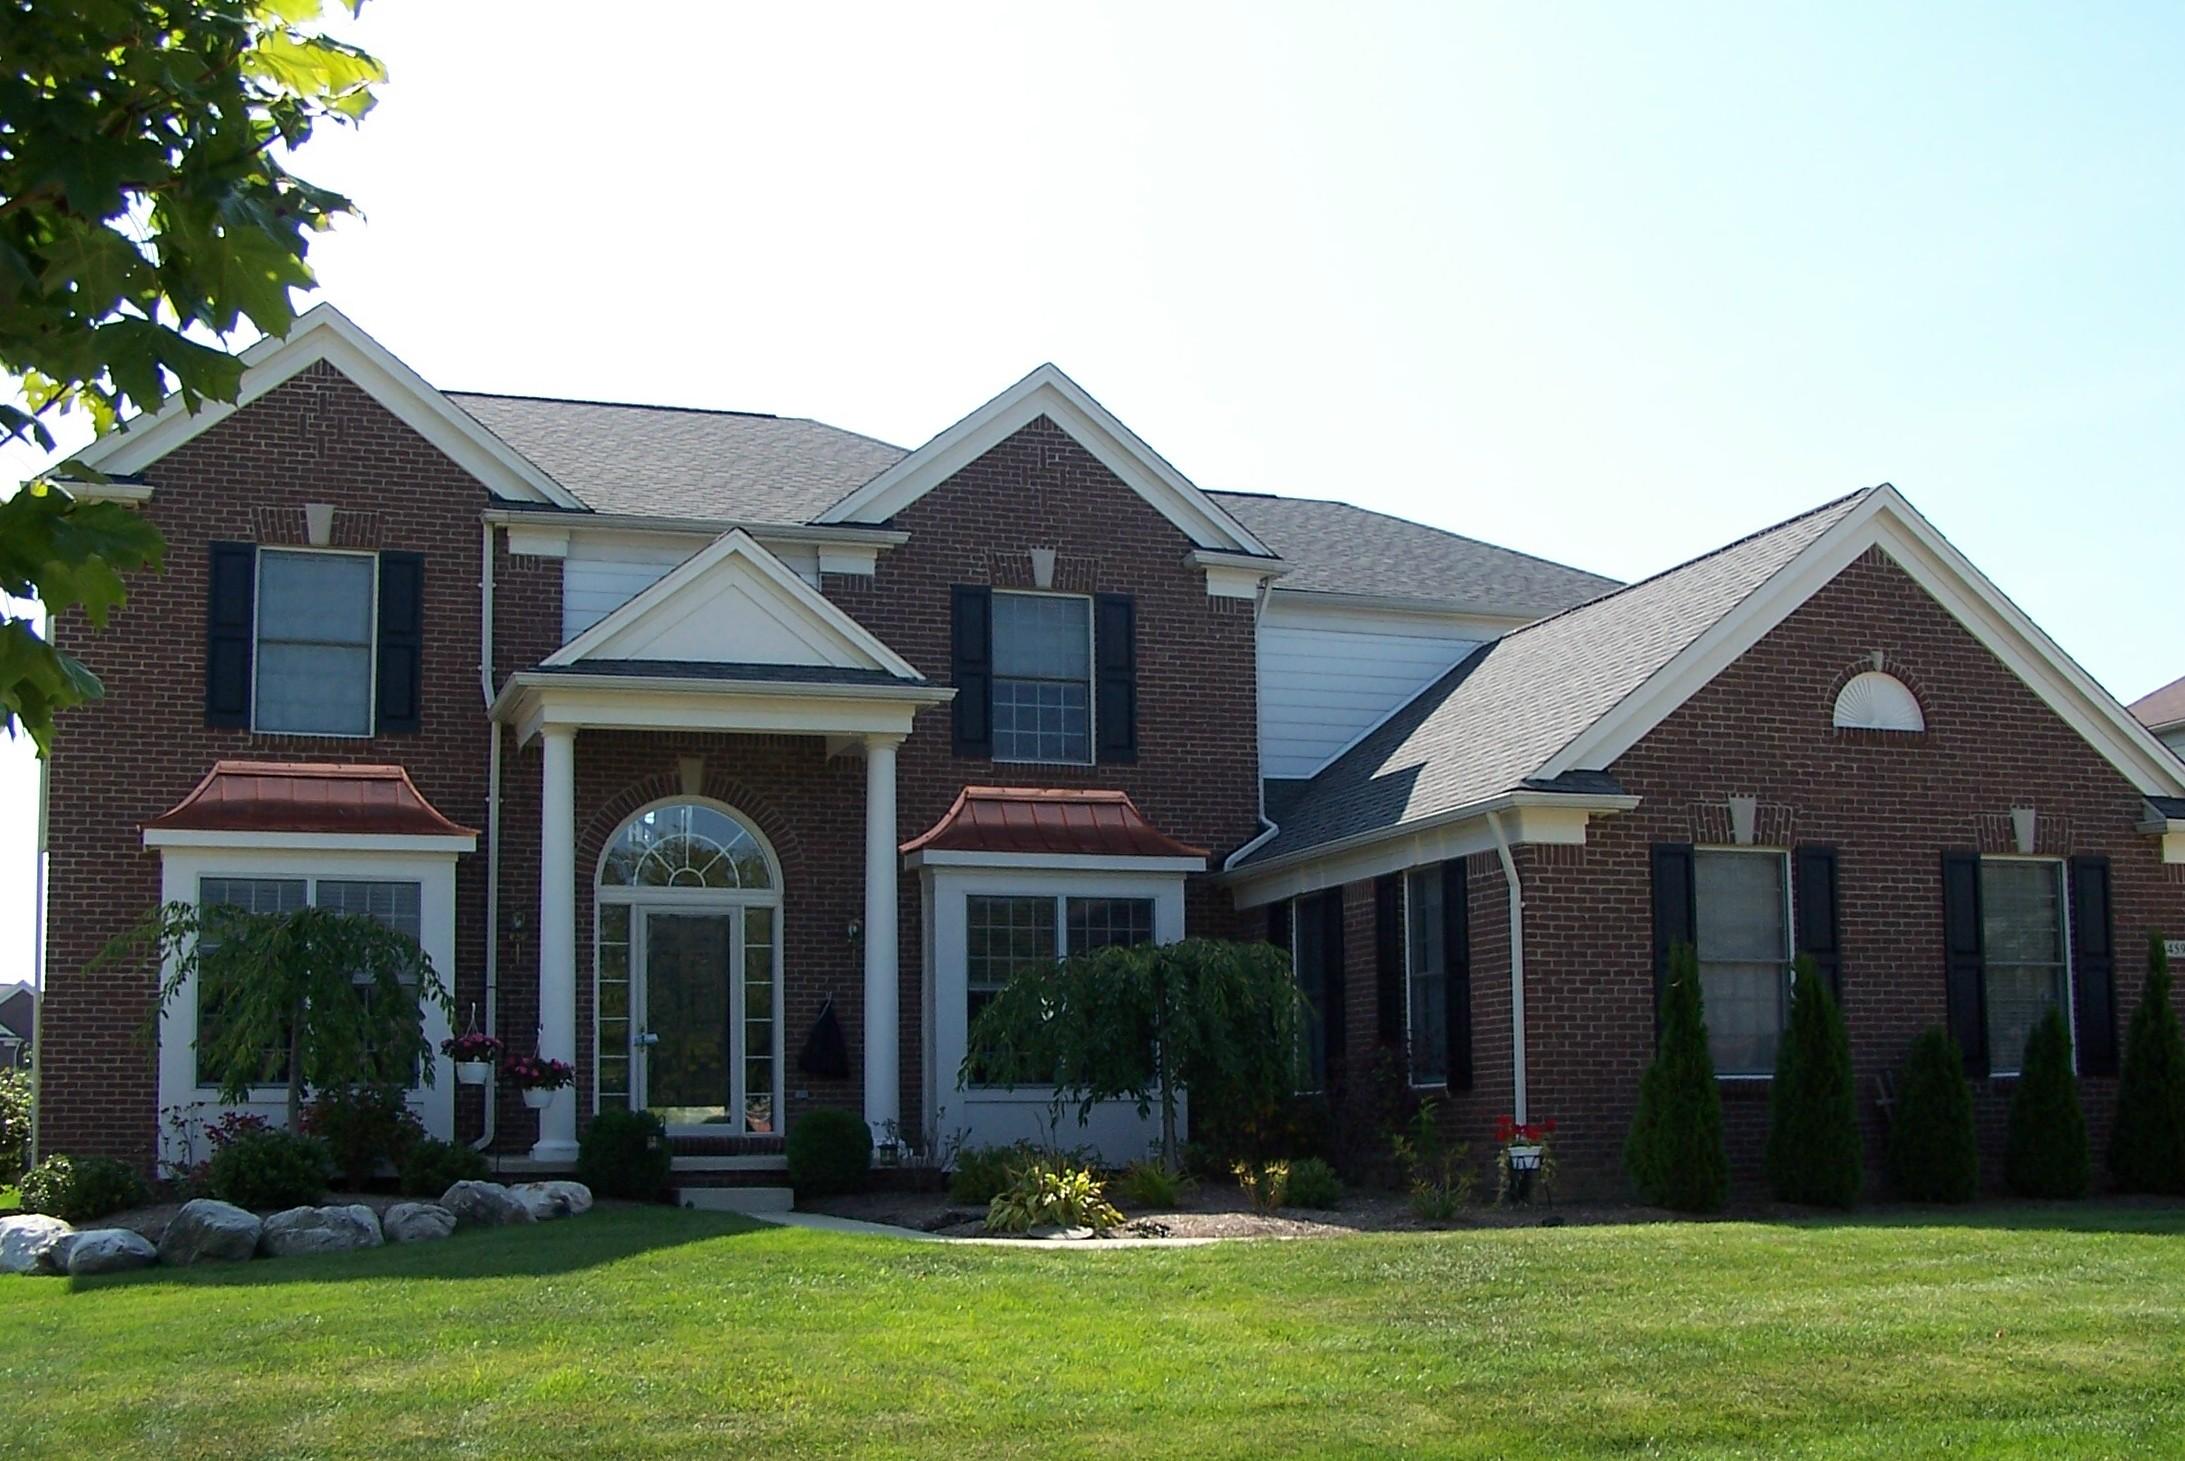 American home design inspiration homesfeed for American house exterior design